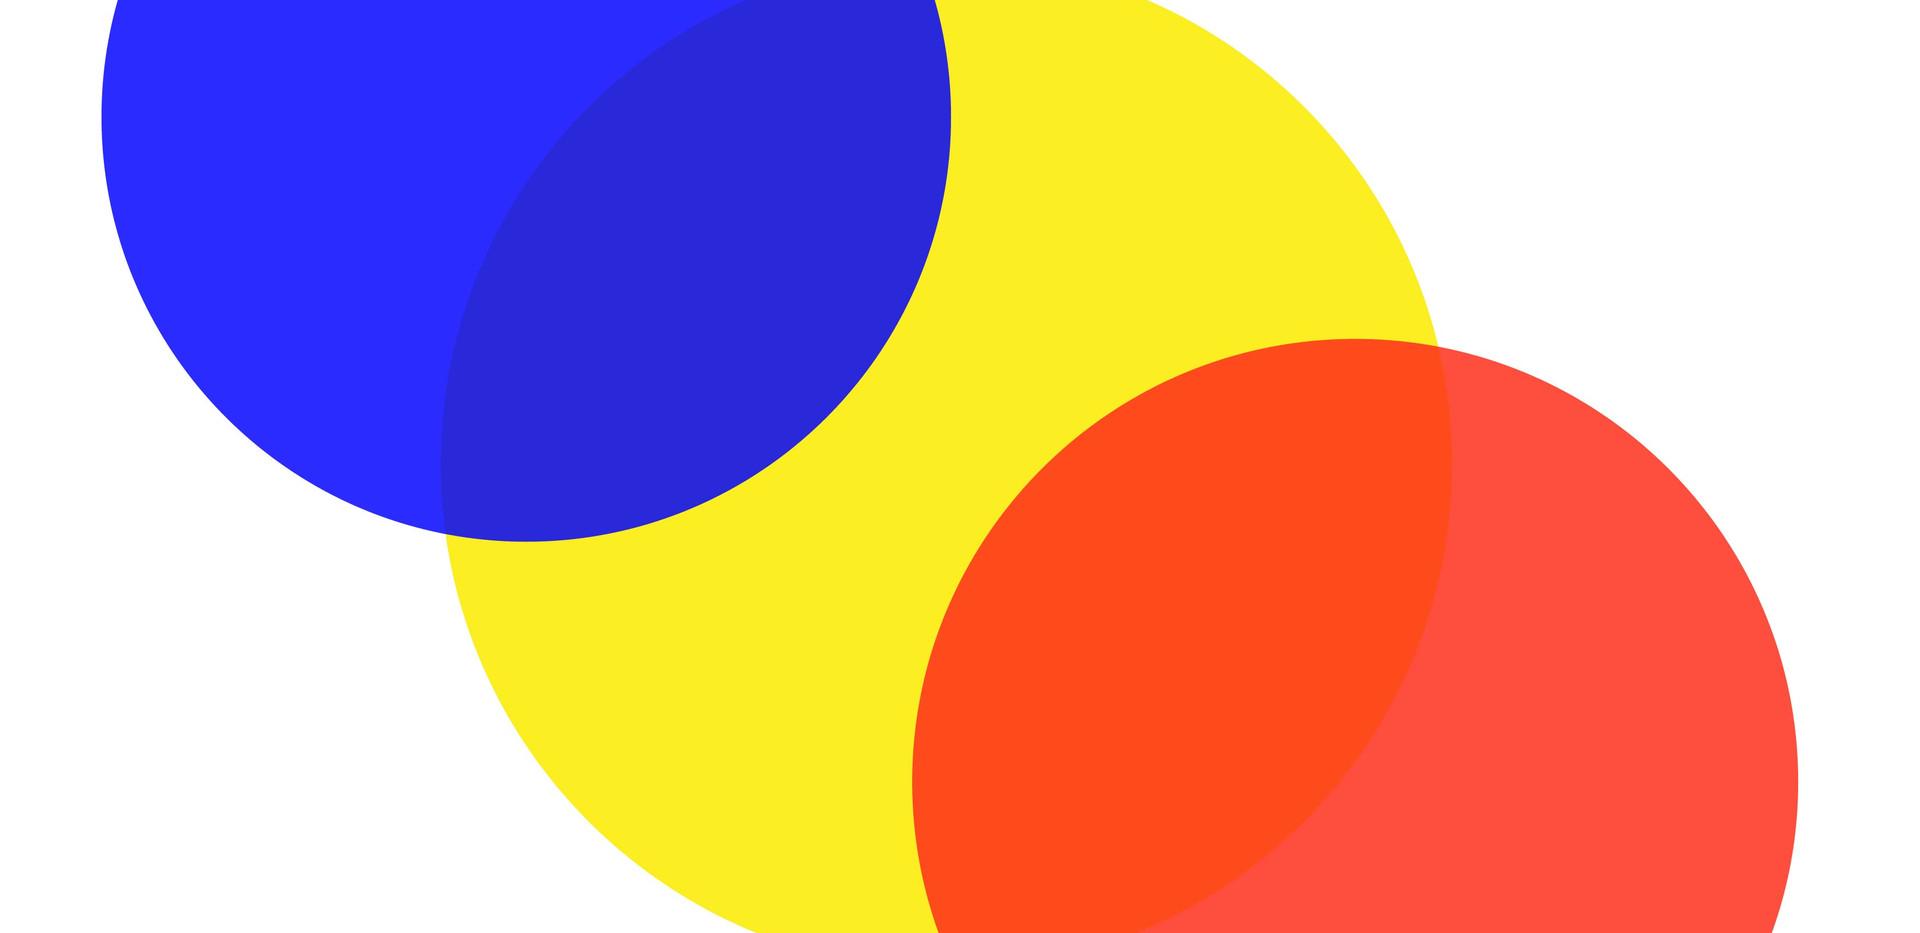 3 circles 2 triangles.jpg